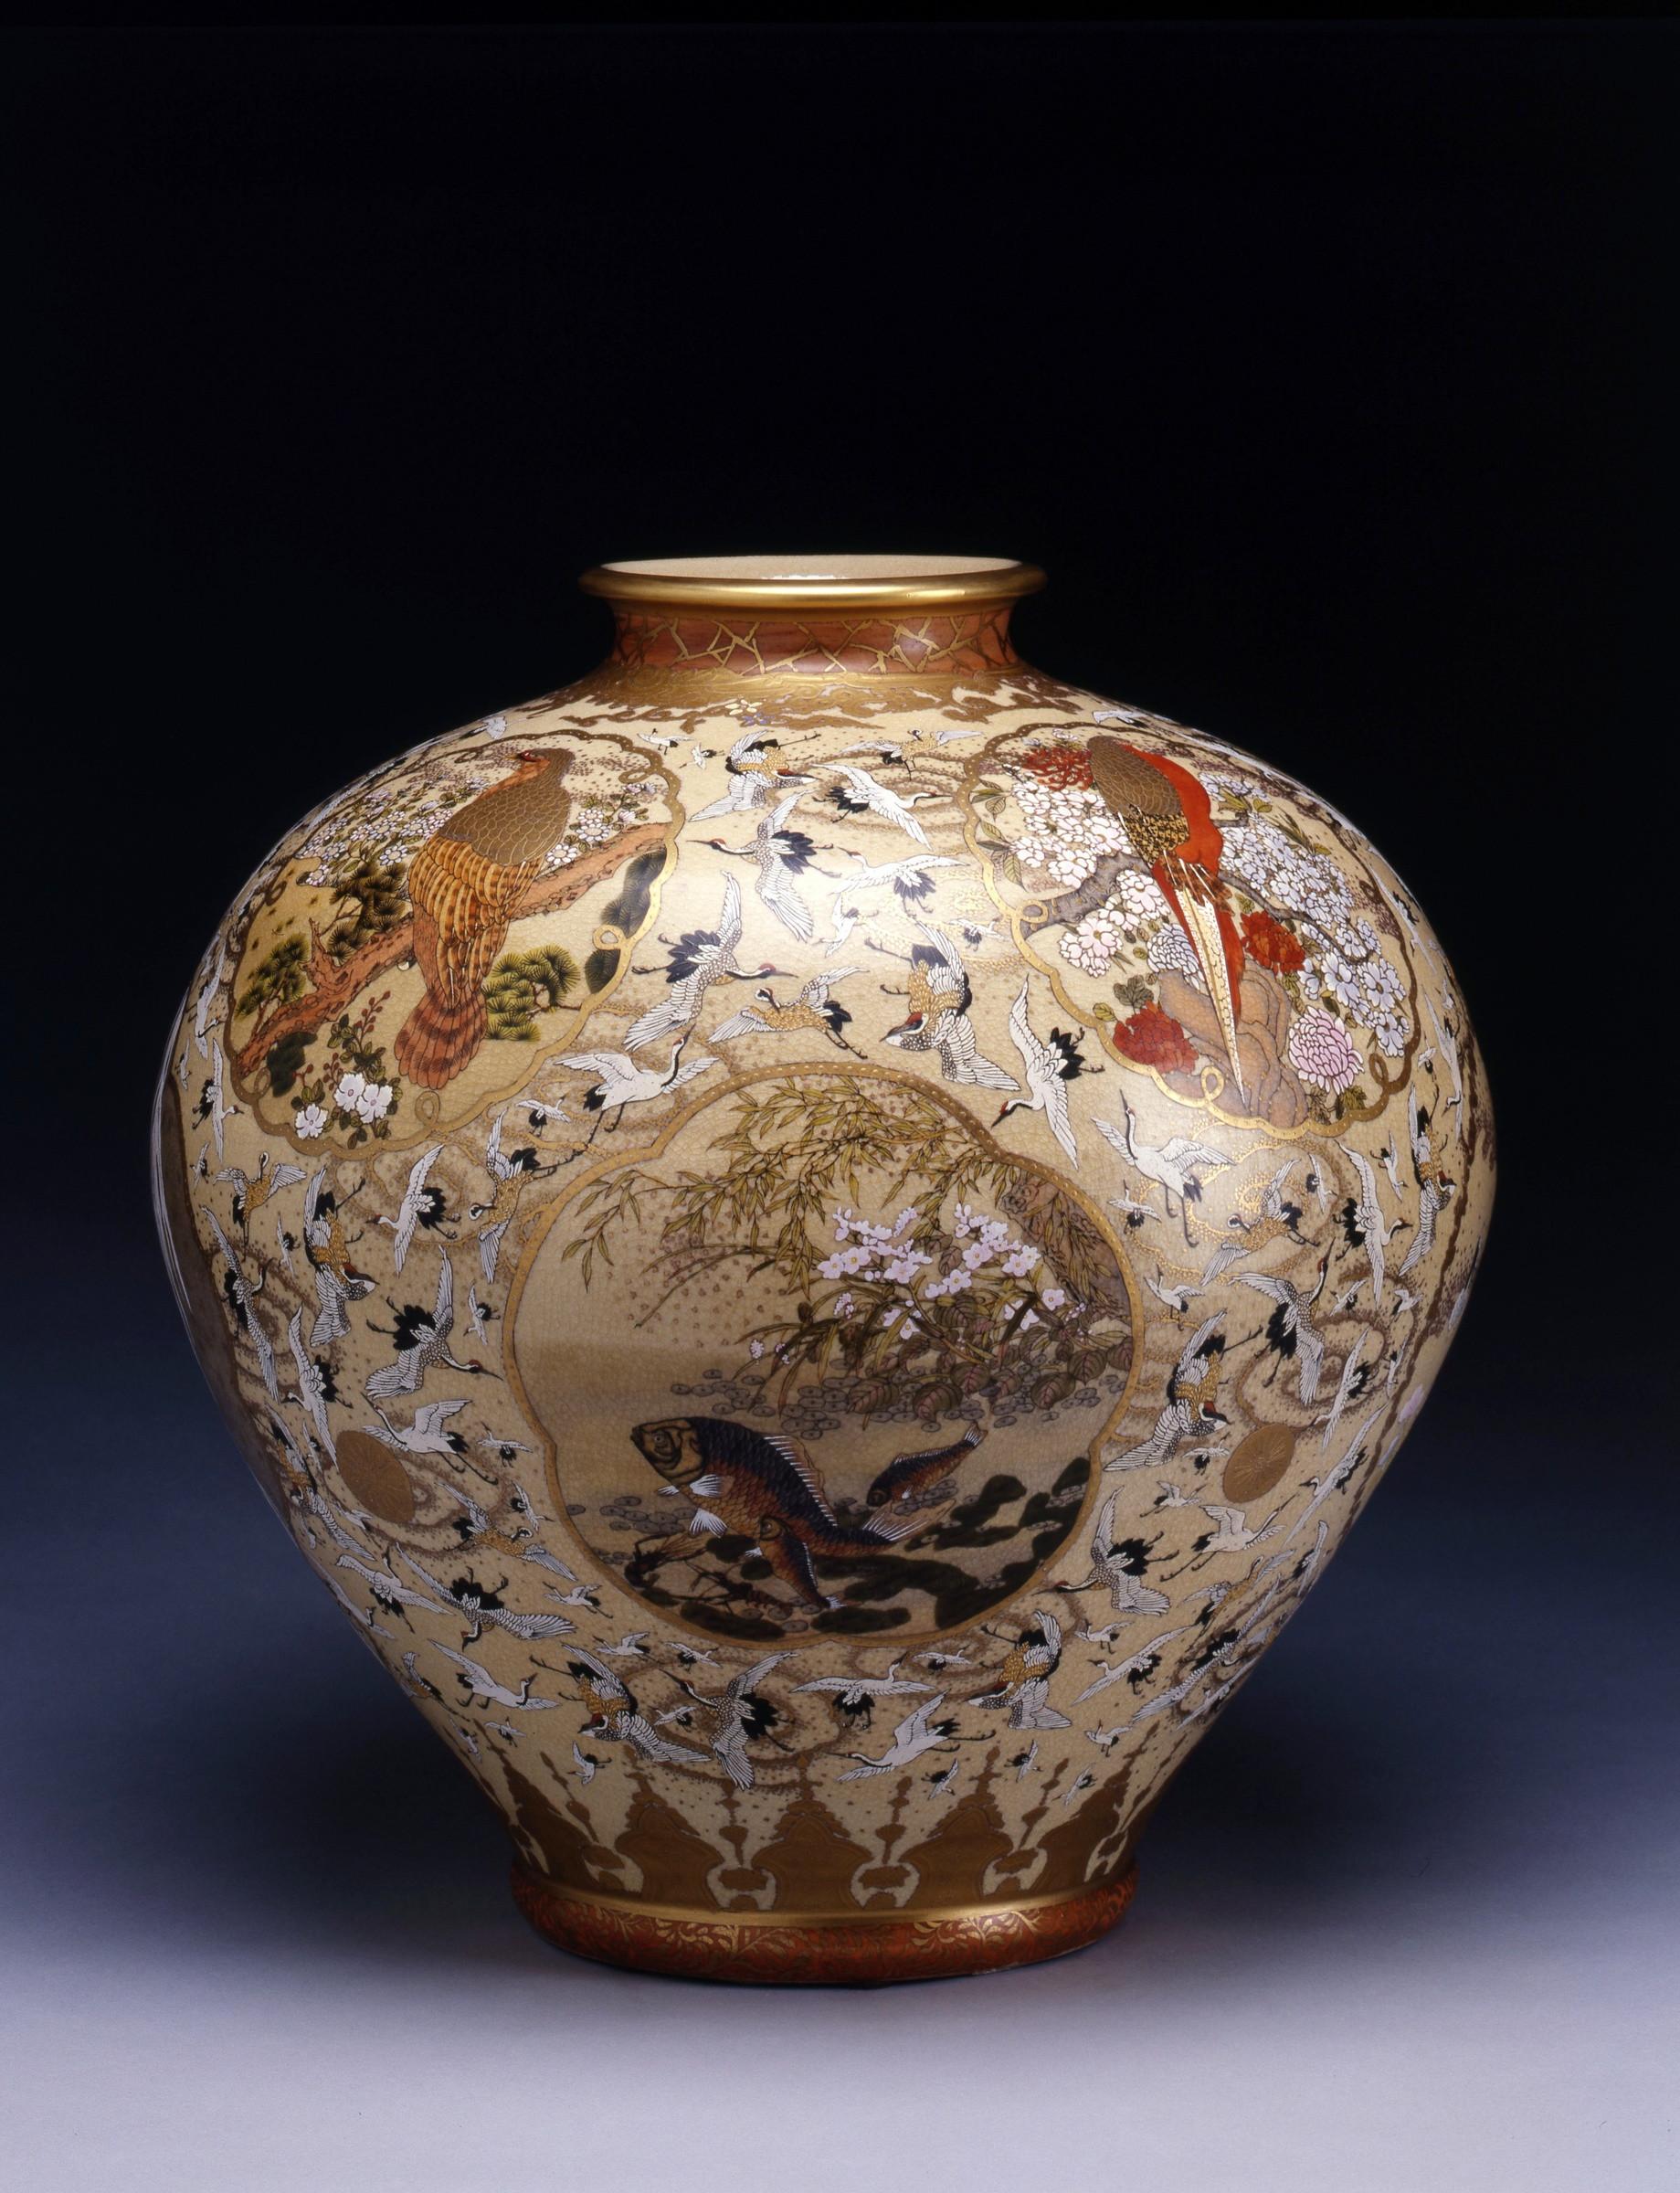 plum vases and bowls of satsuma a set of three satsuma pieces japan date circa 1880 1910 with a set of three satsuma pieces